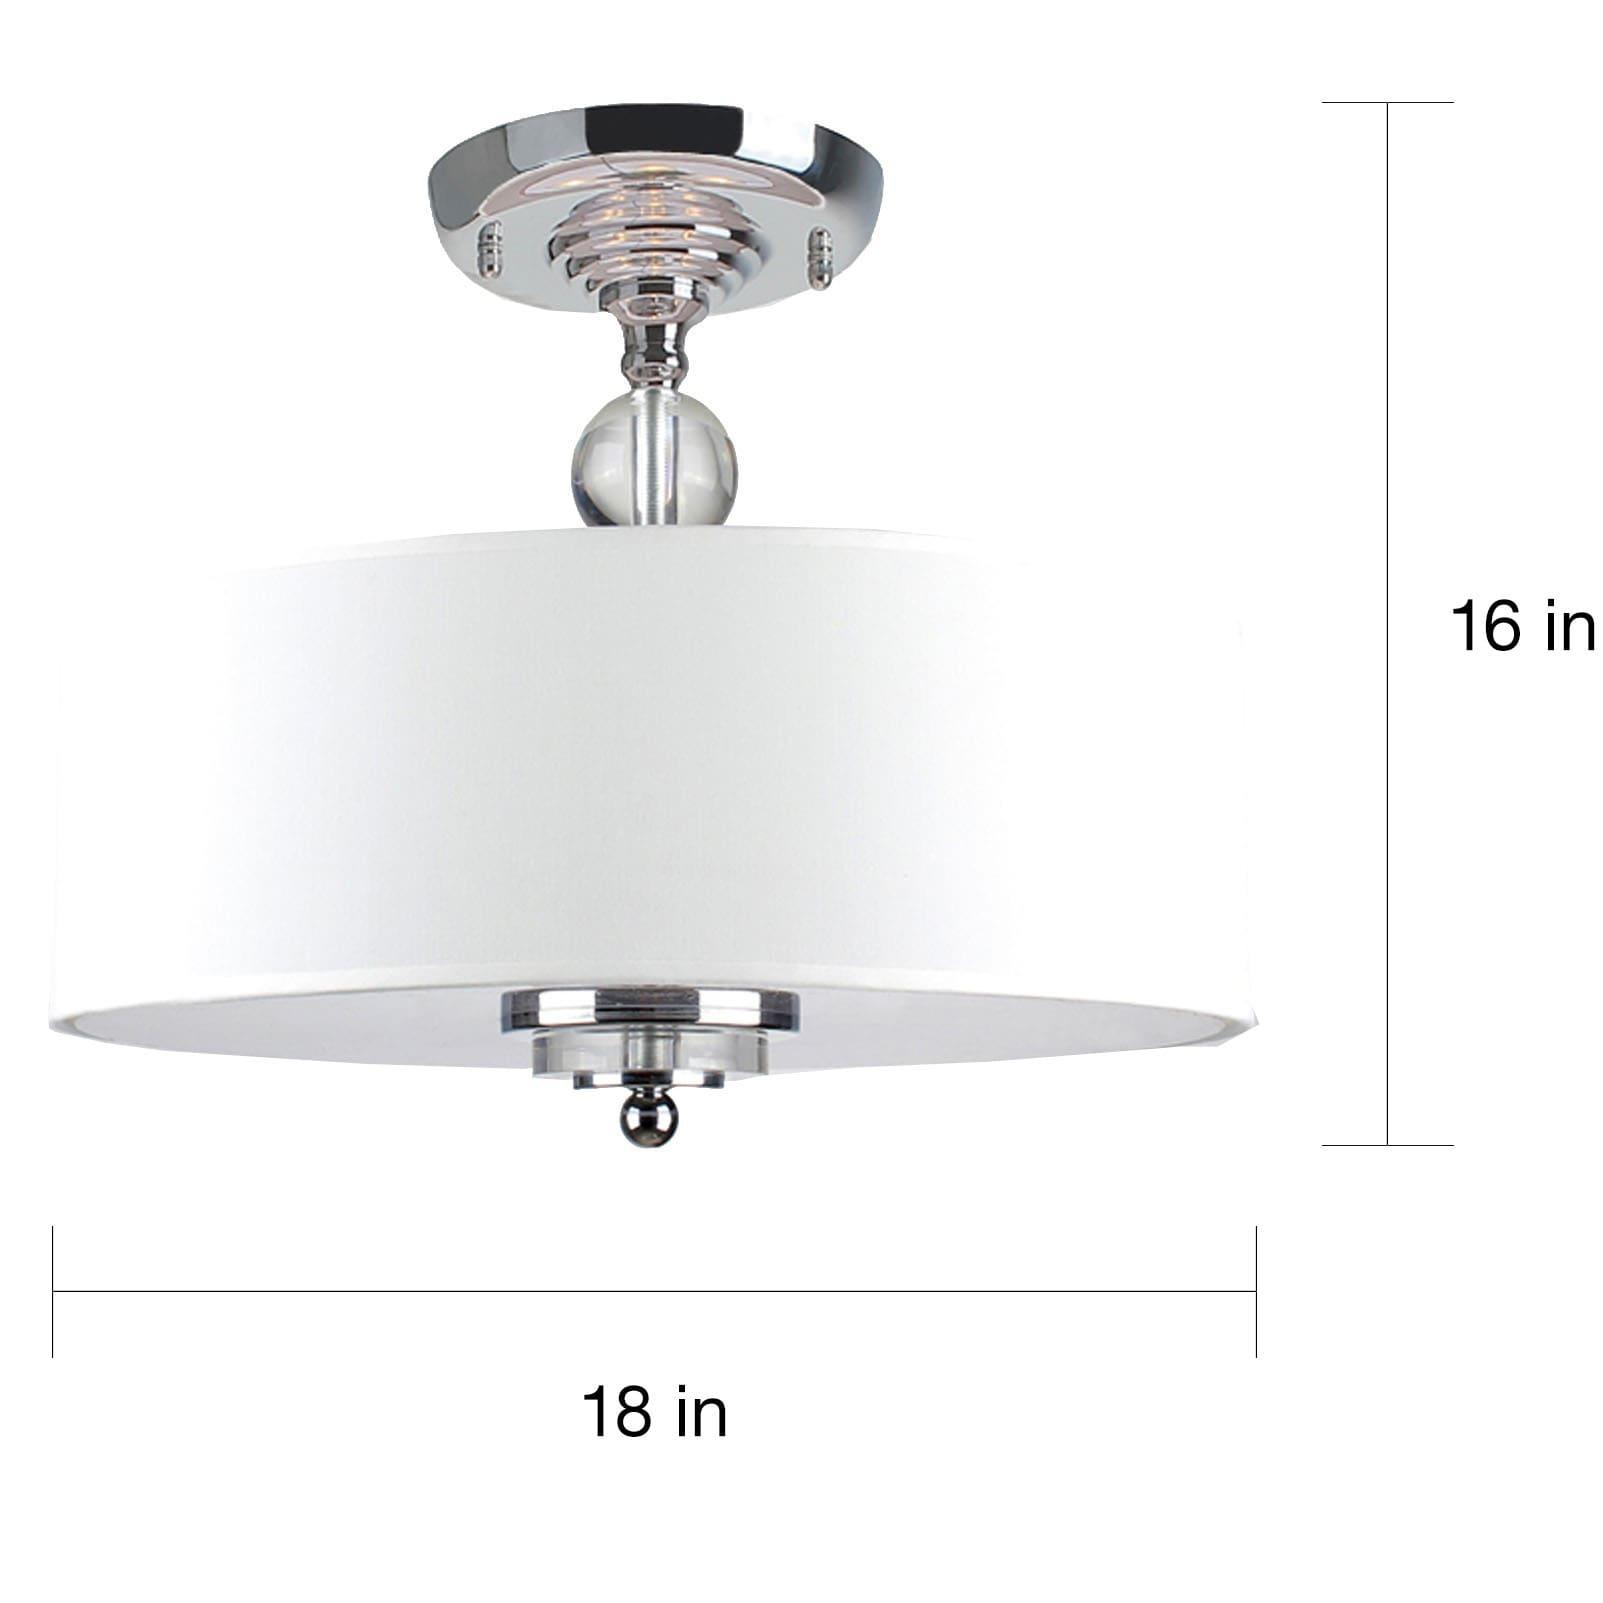 minka aire diameter gallery blade pitch ceiling aiea mount fan bn flush hi ii fans traditional mojo